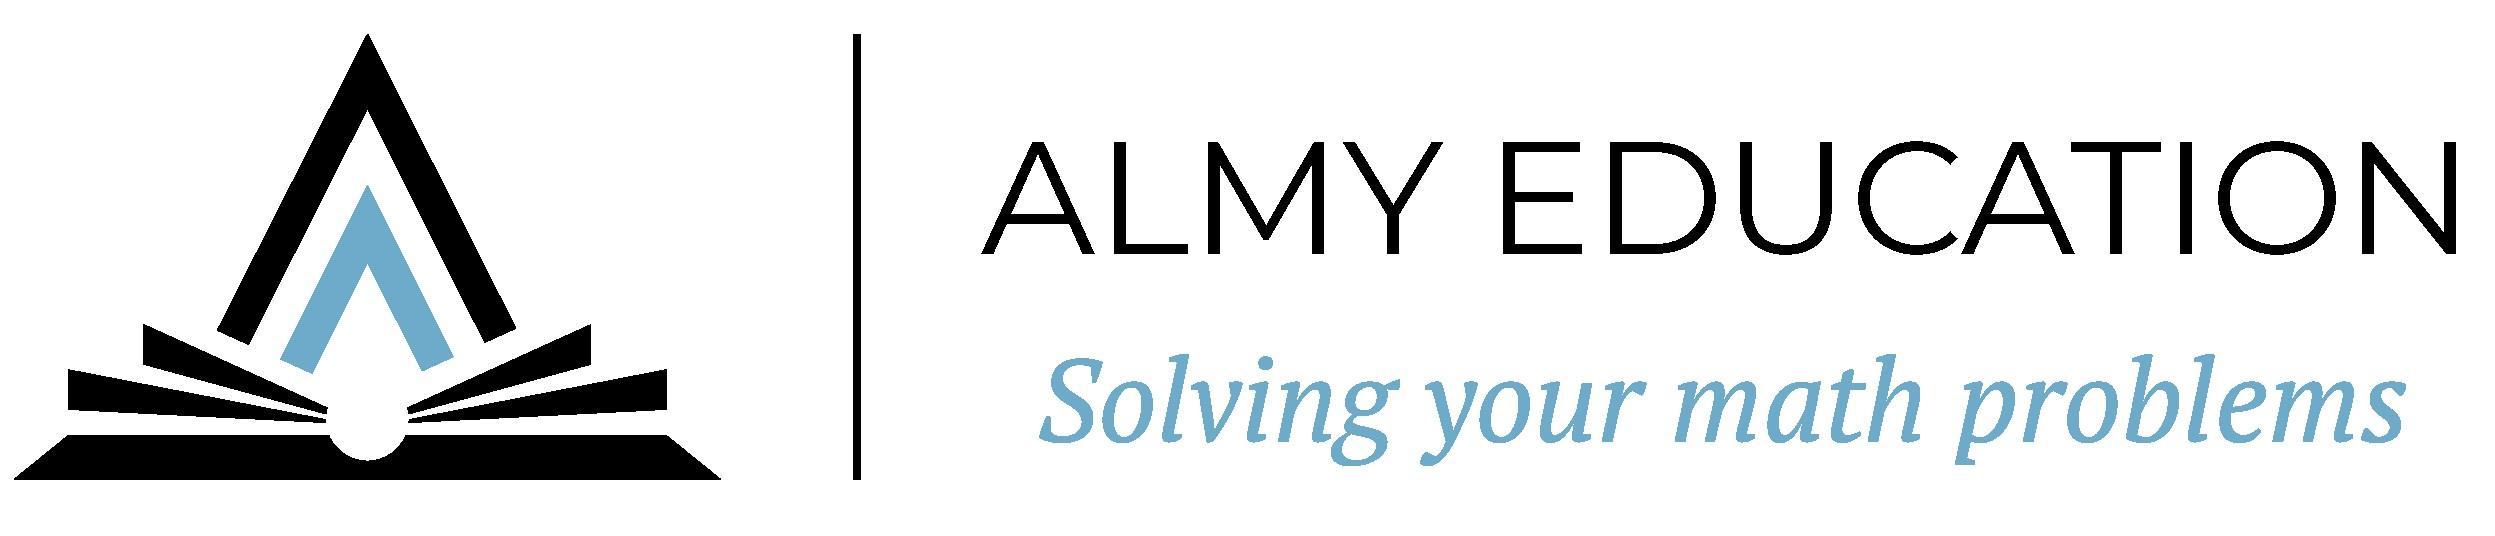 Almy Education